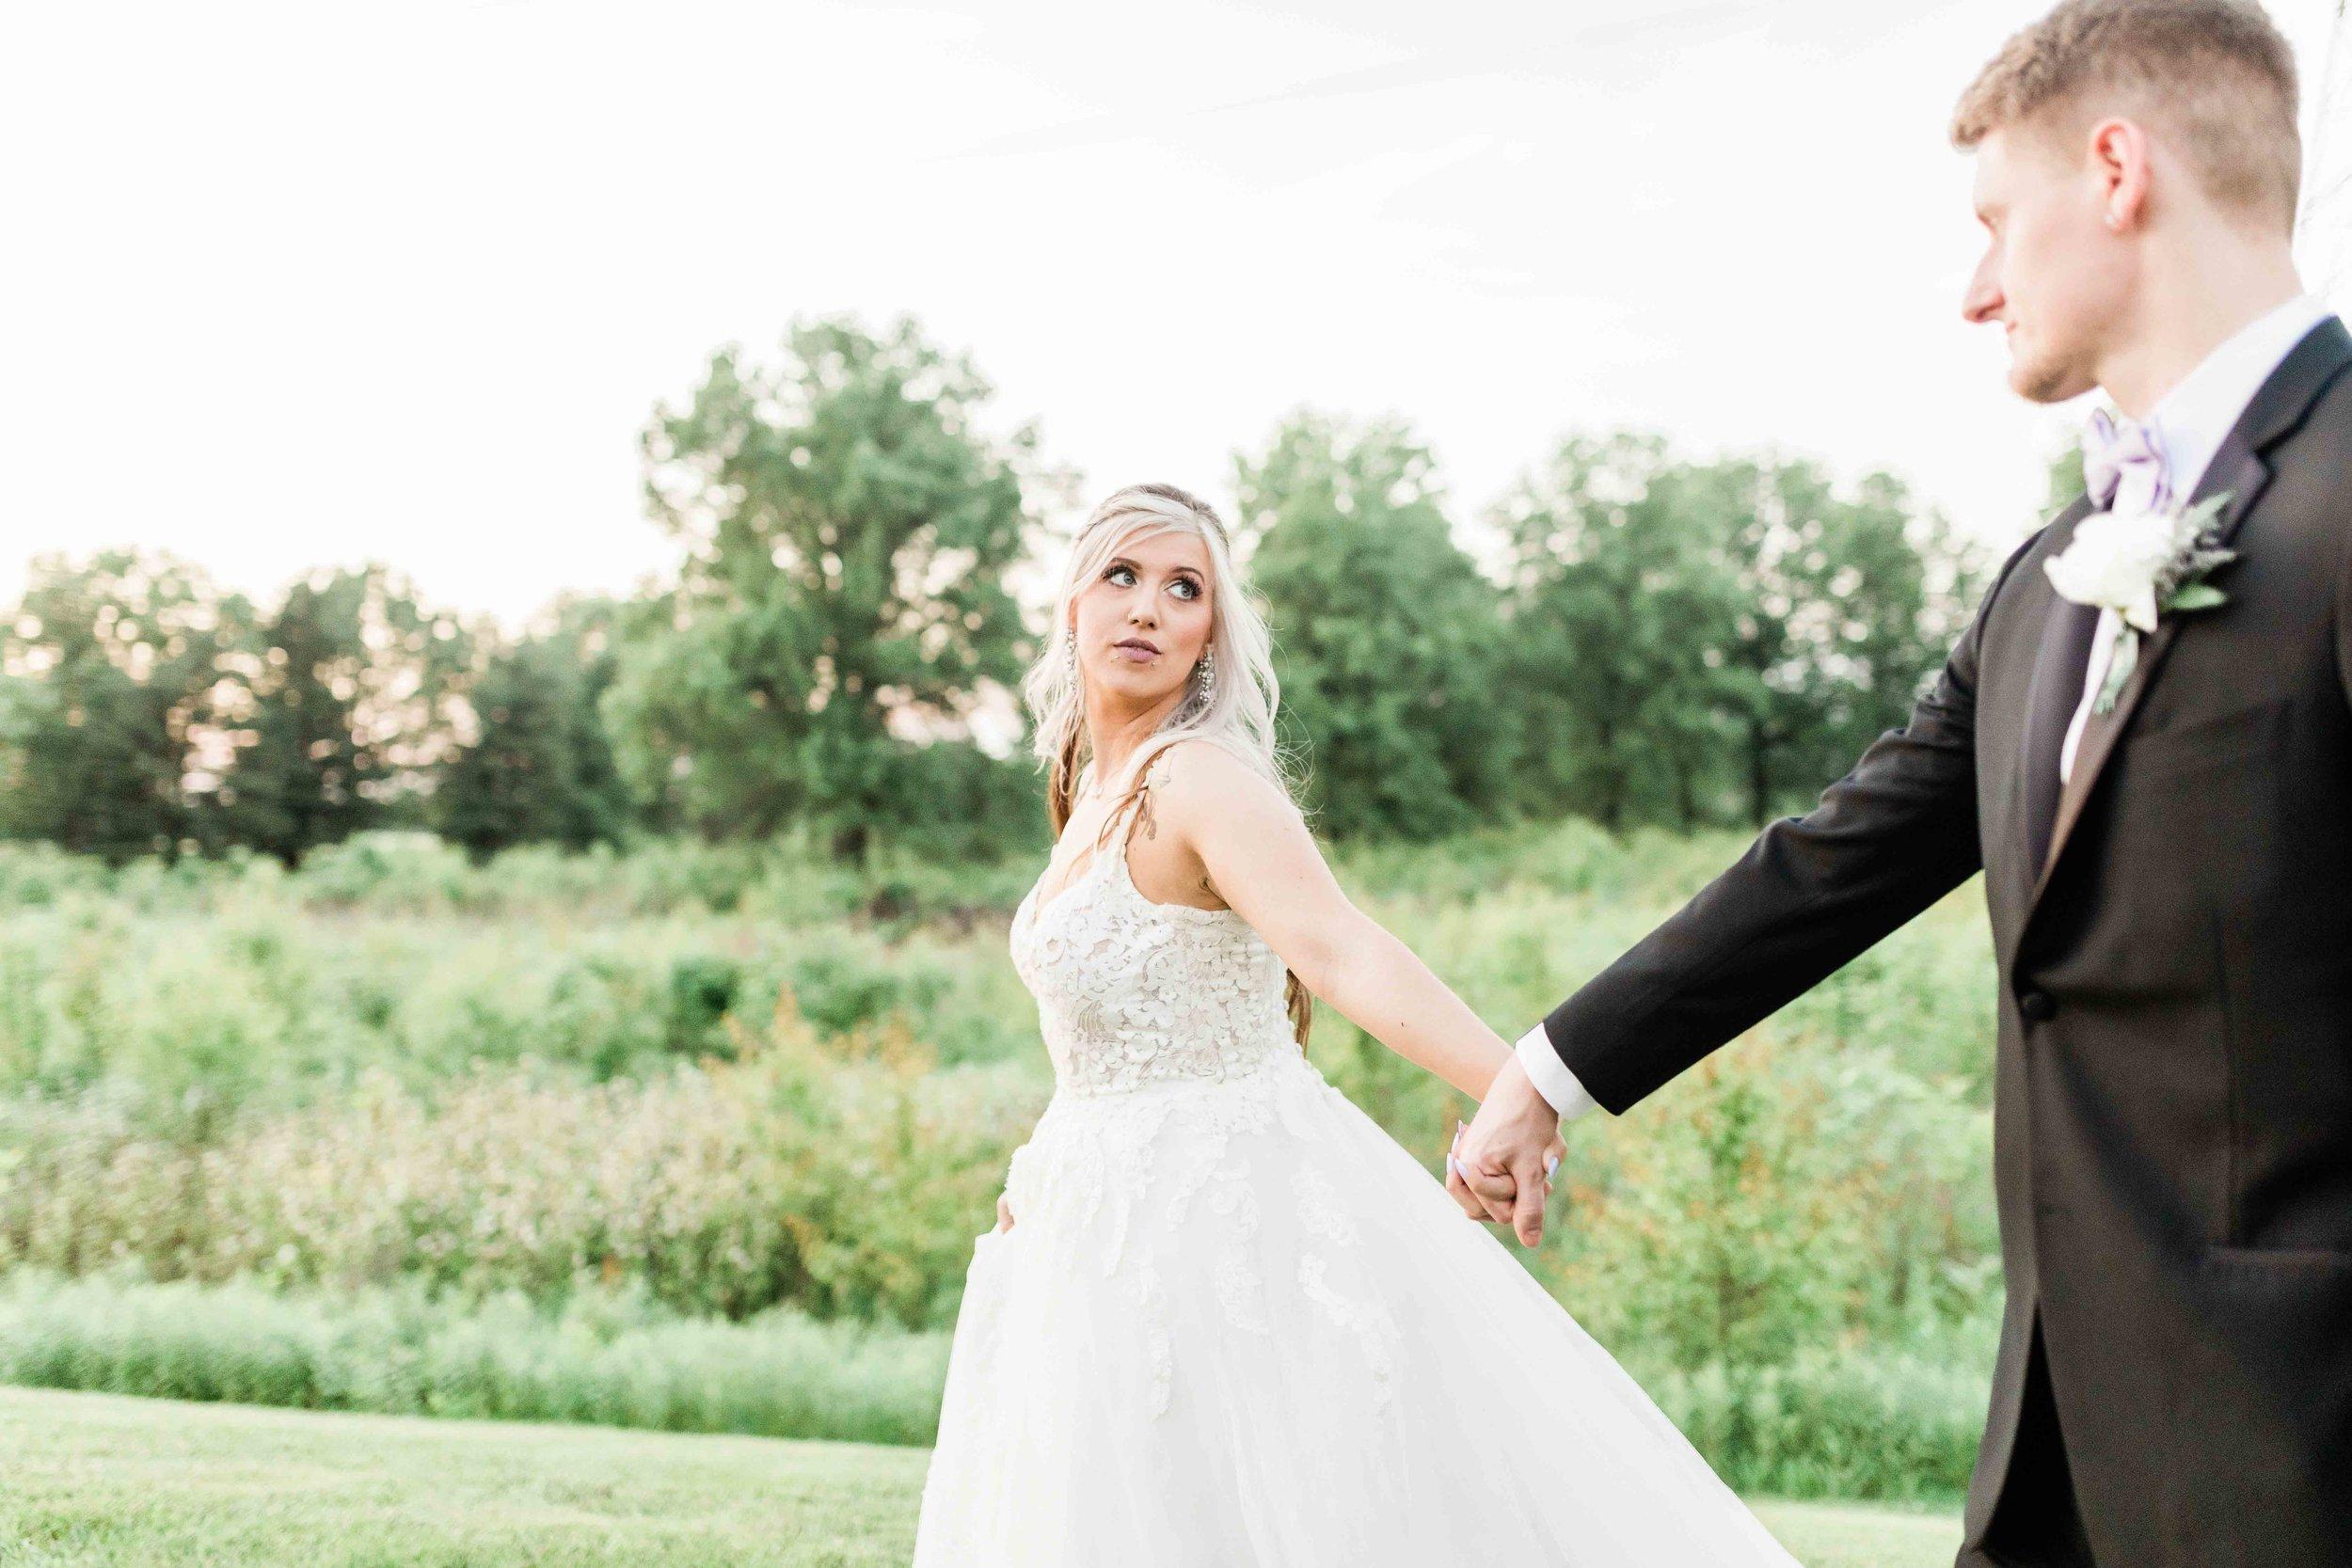 wedding photographers nky southwest ohio cincinnati dayton-8.jpg